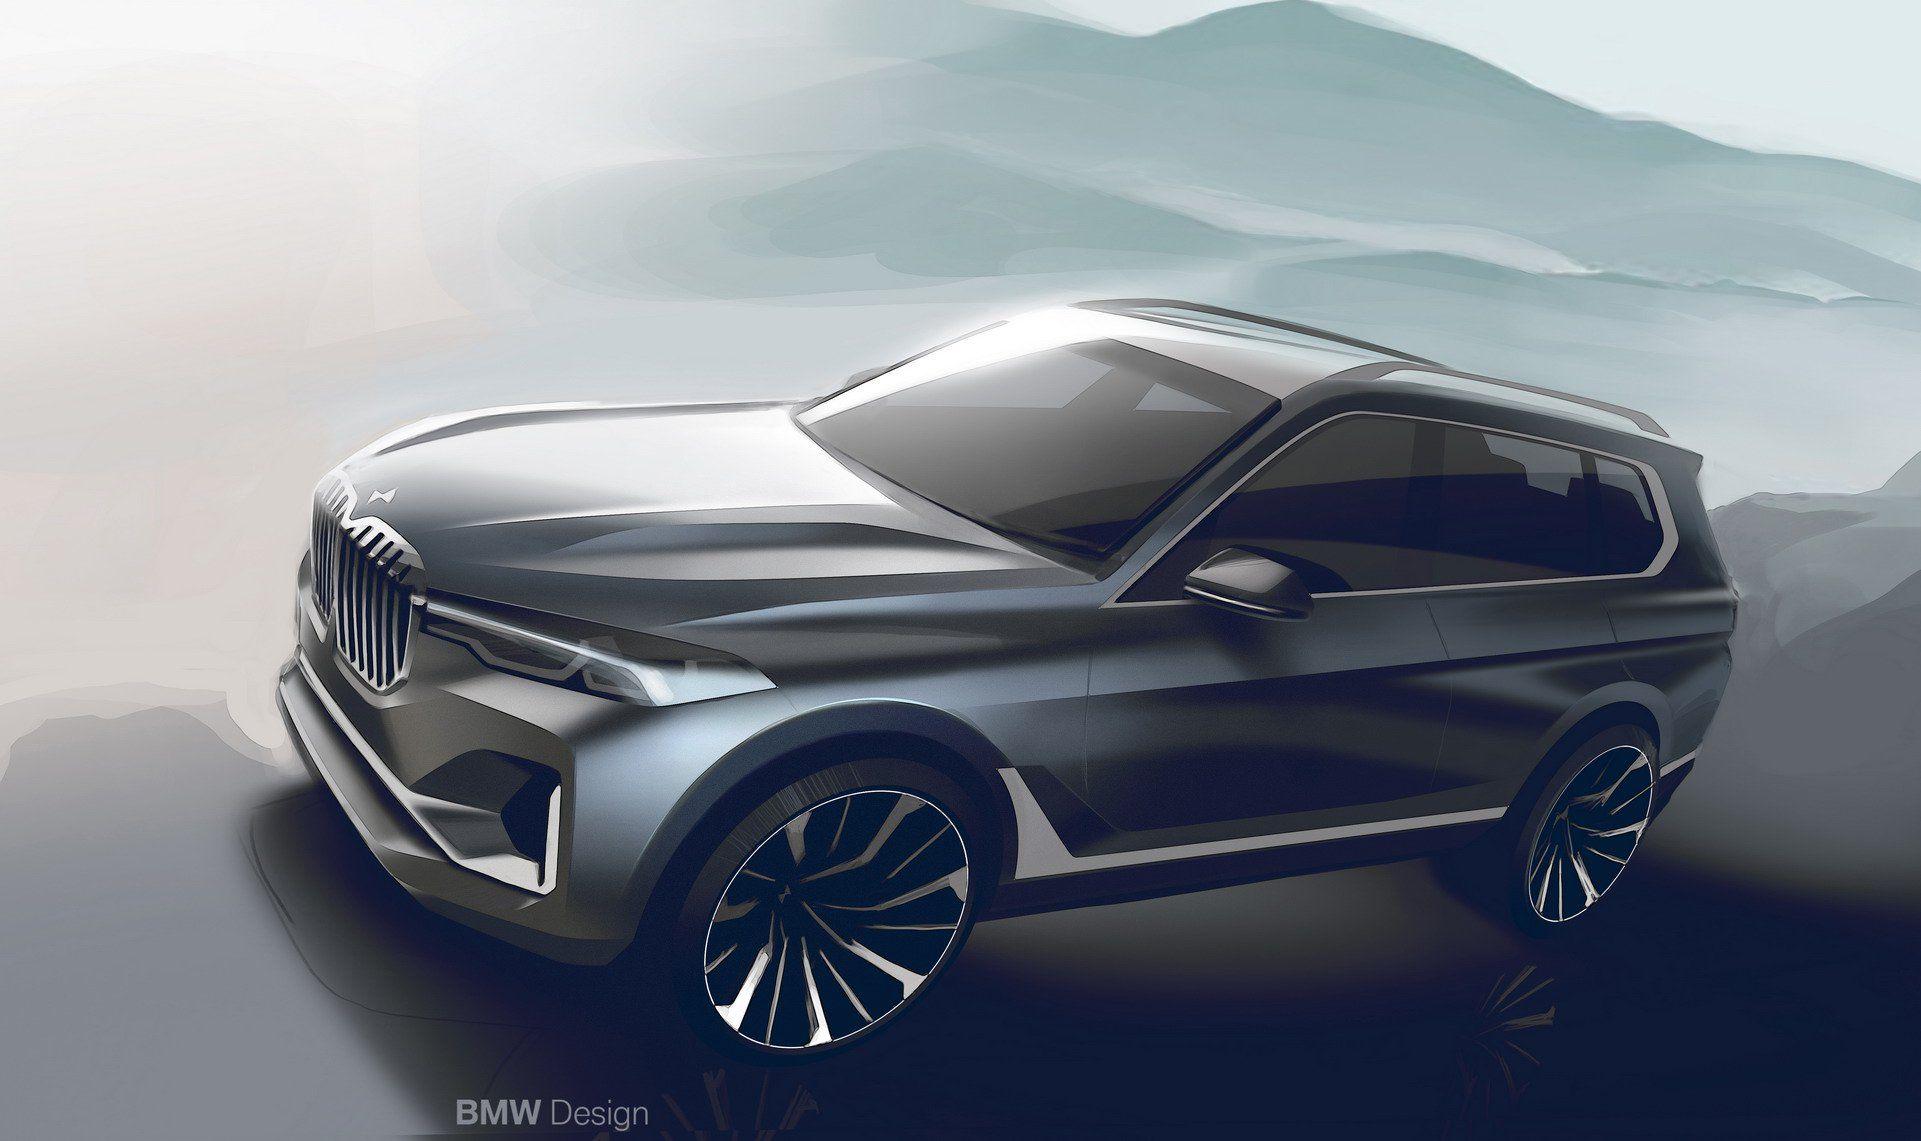 2019 Bmw X7 As Big As A Cadillac Escalade As Luxurious As A Rolls